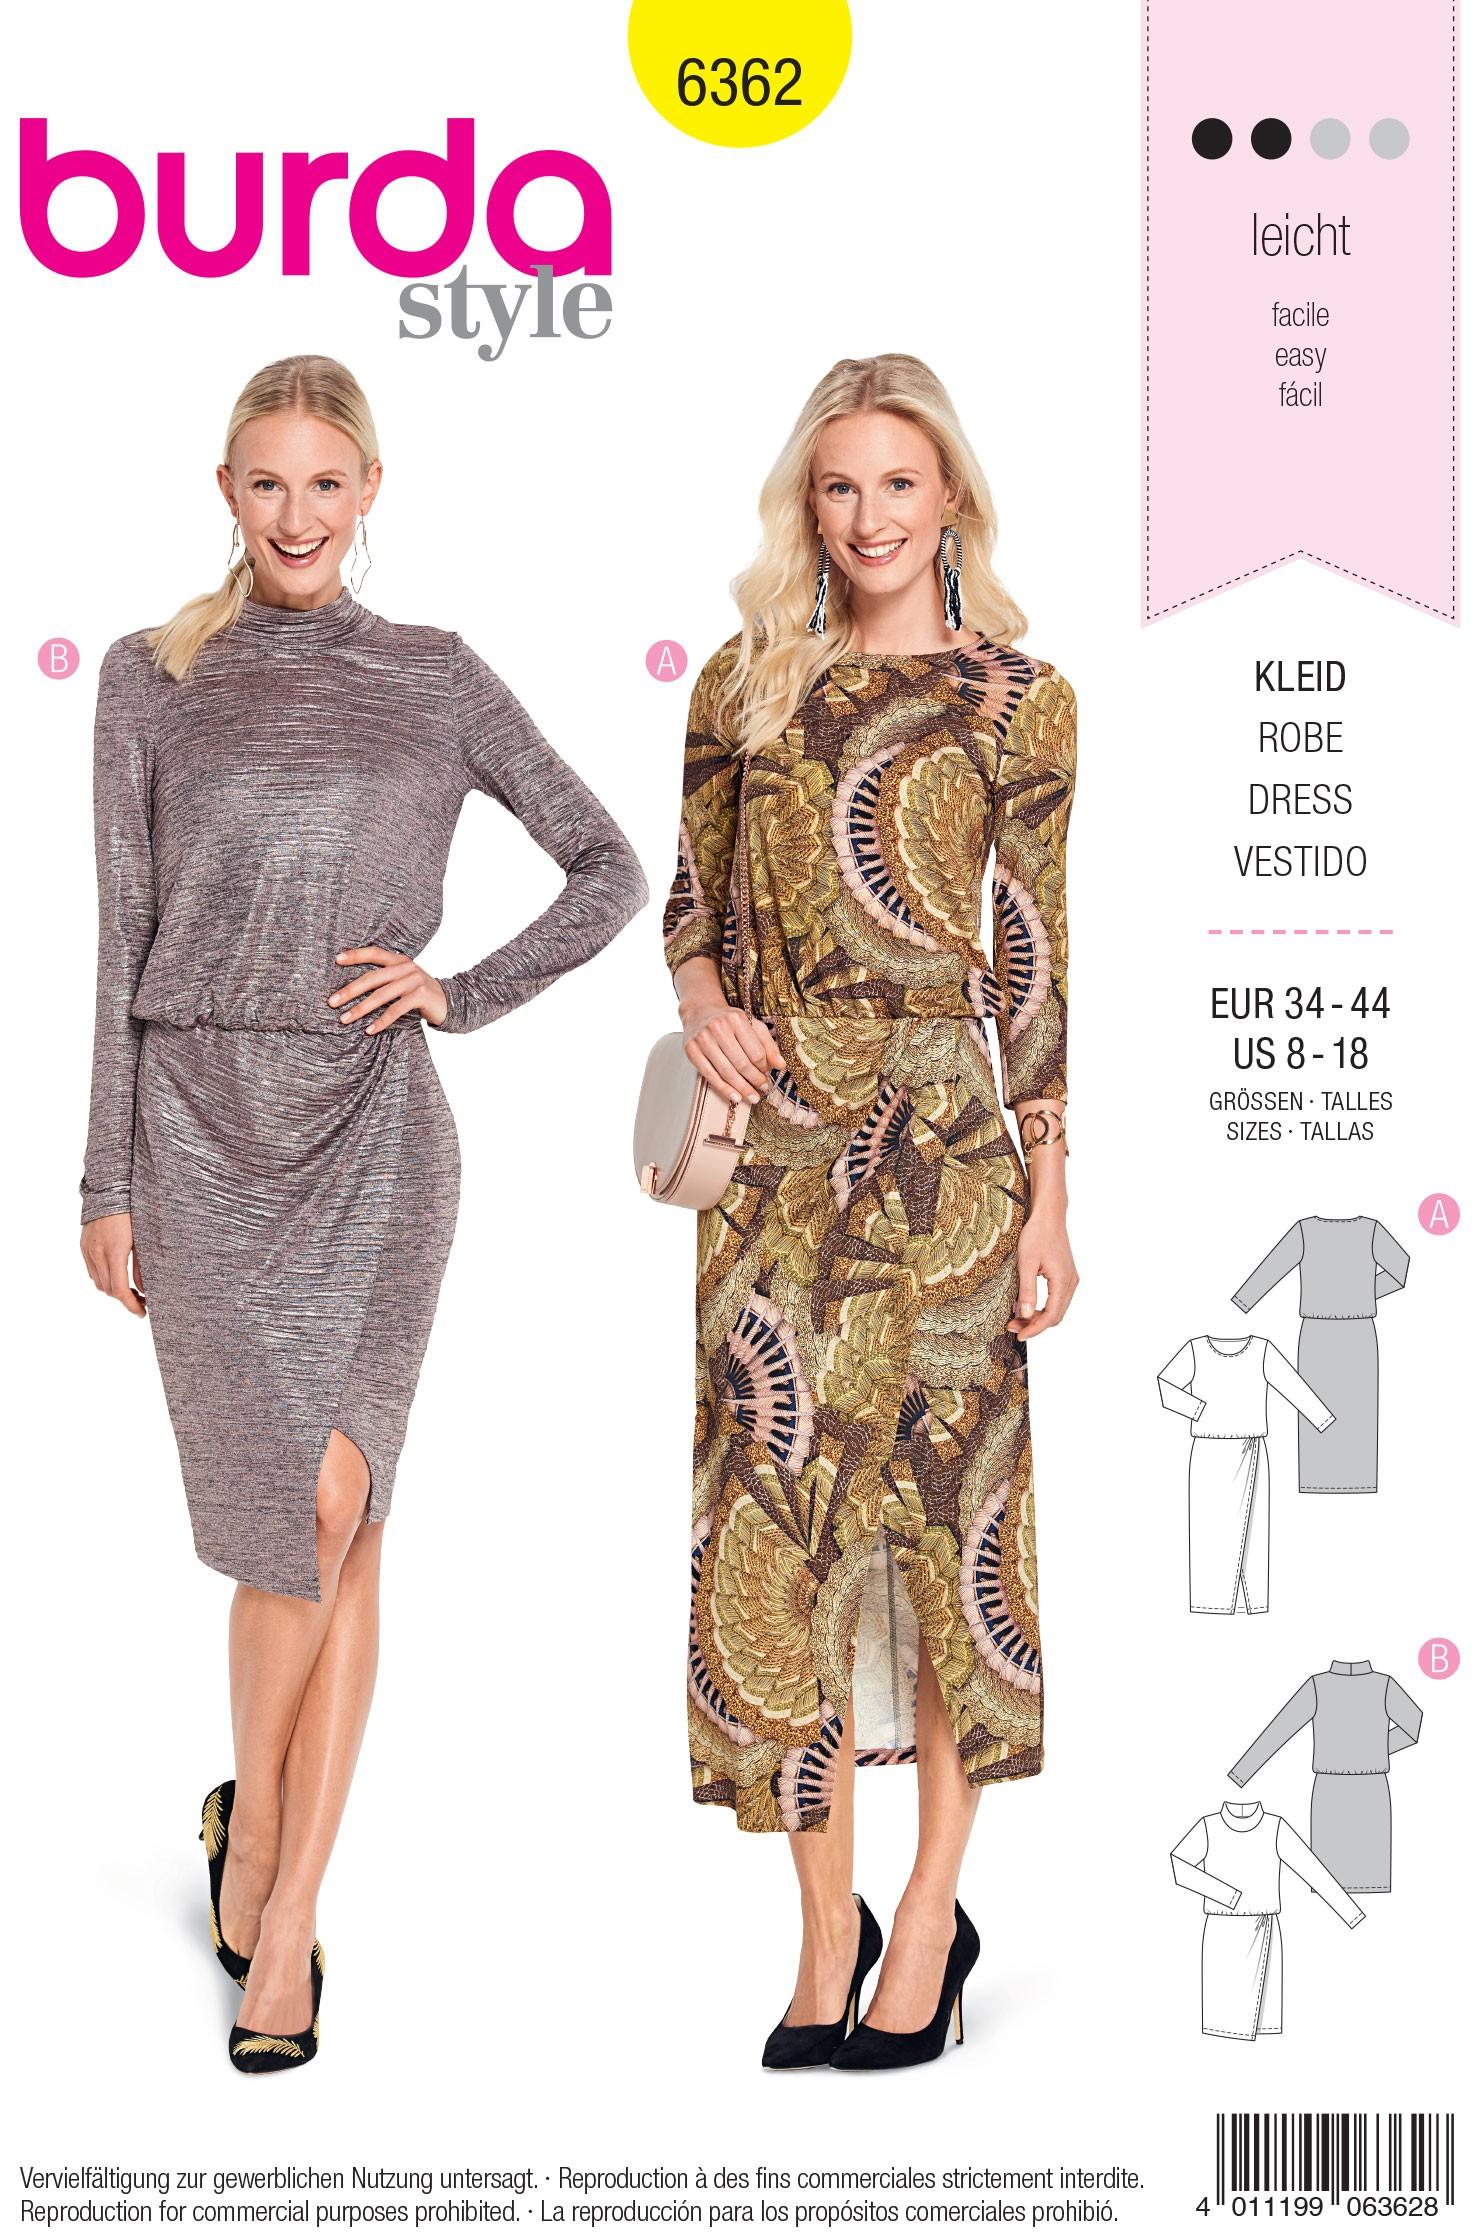 Burda Sewing Pattern 6362 Style Woman's Jersey Smart Formal Dress